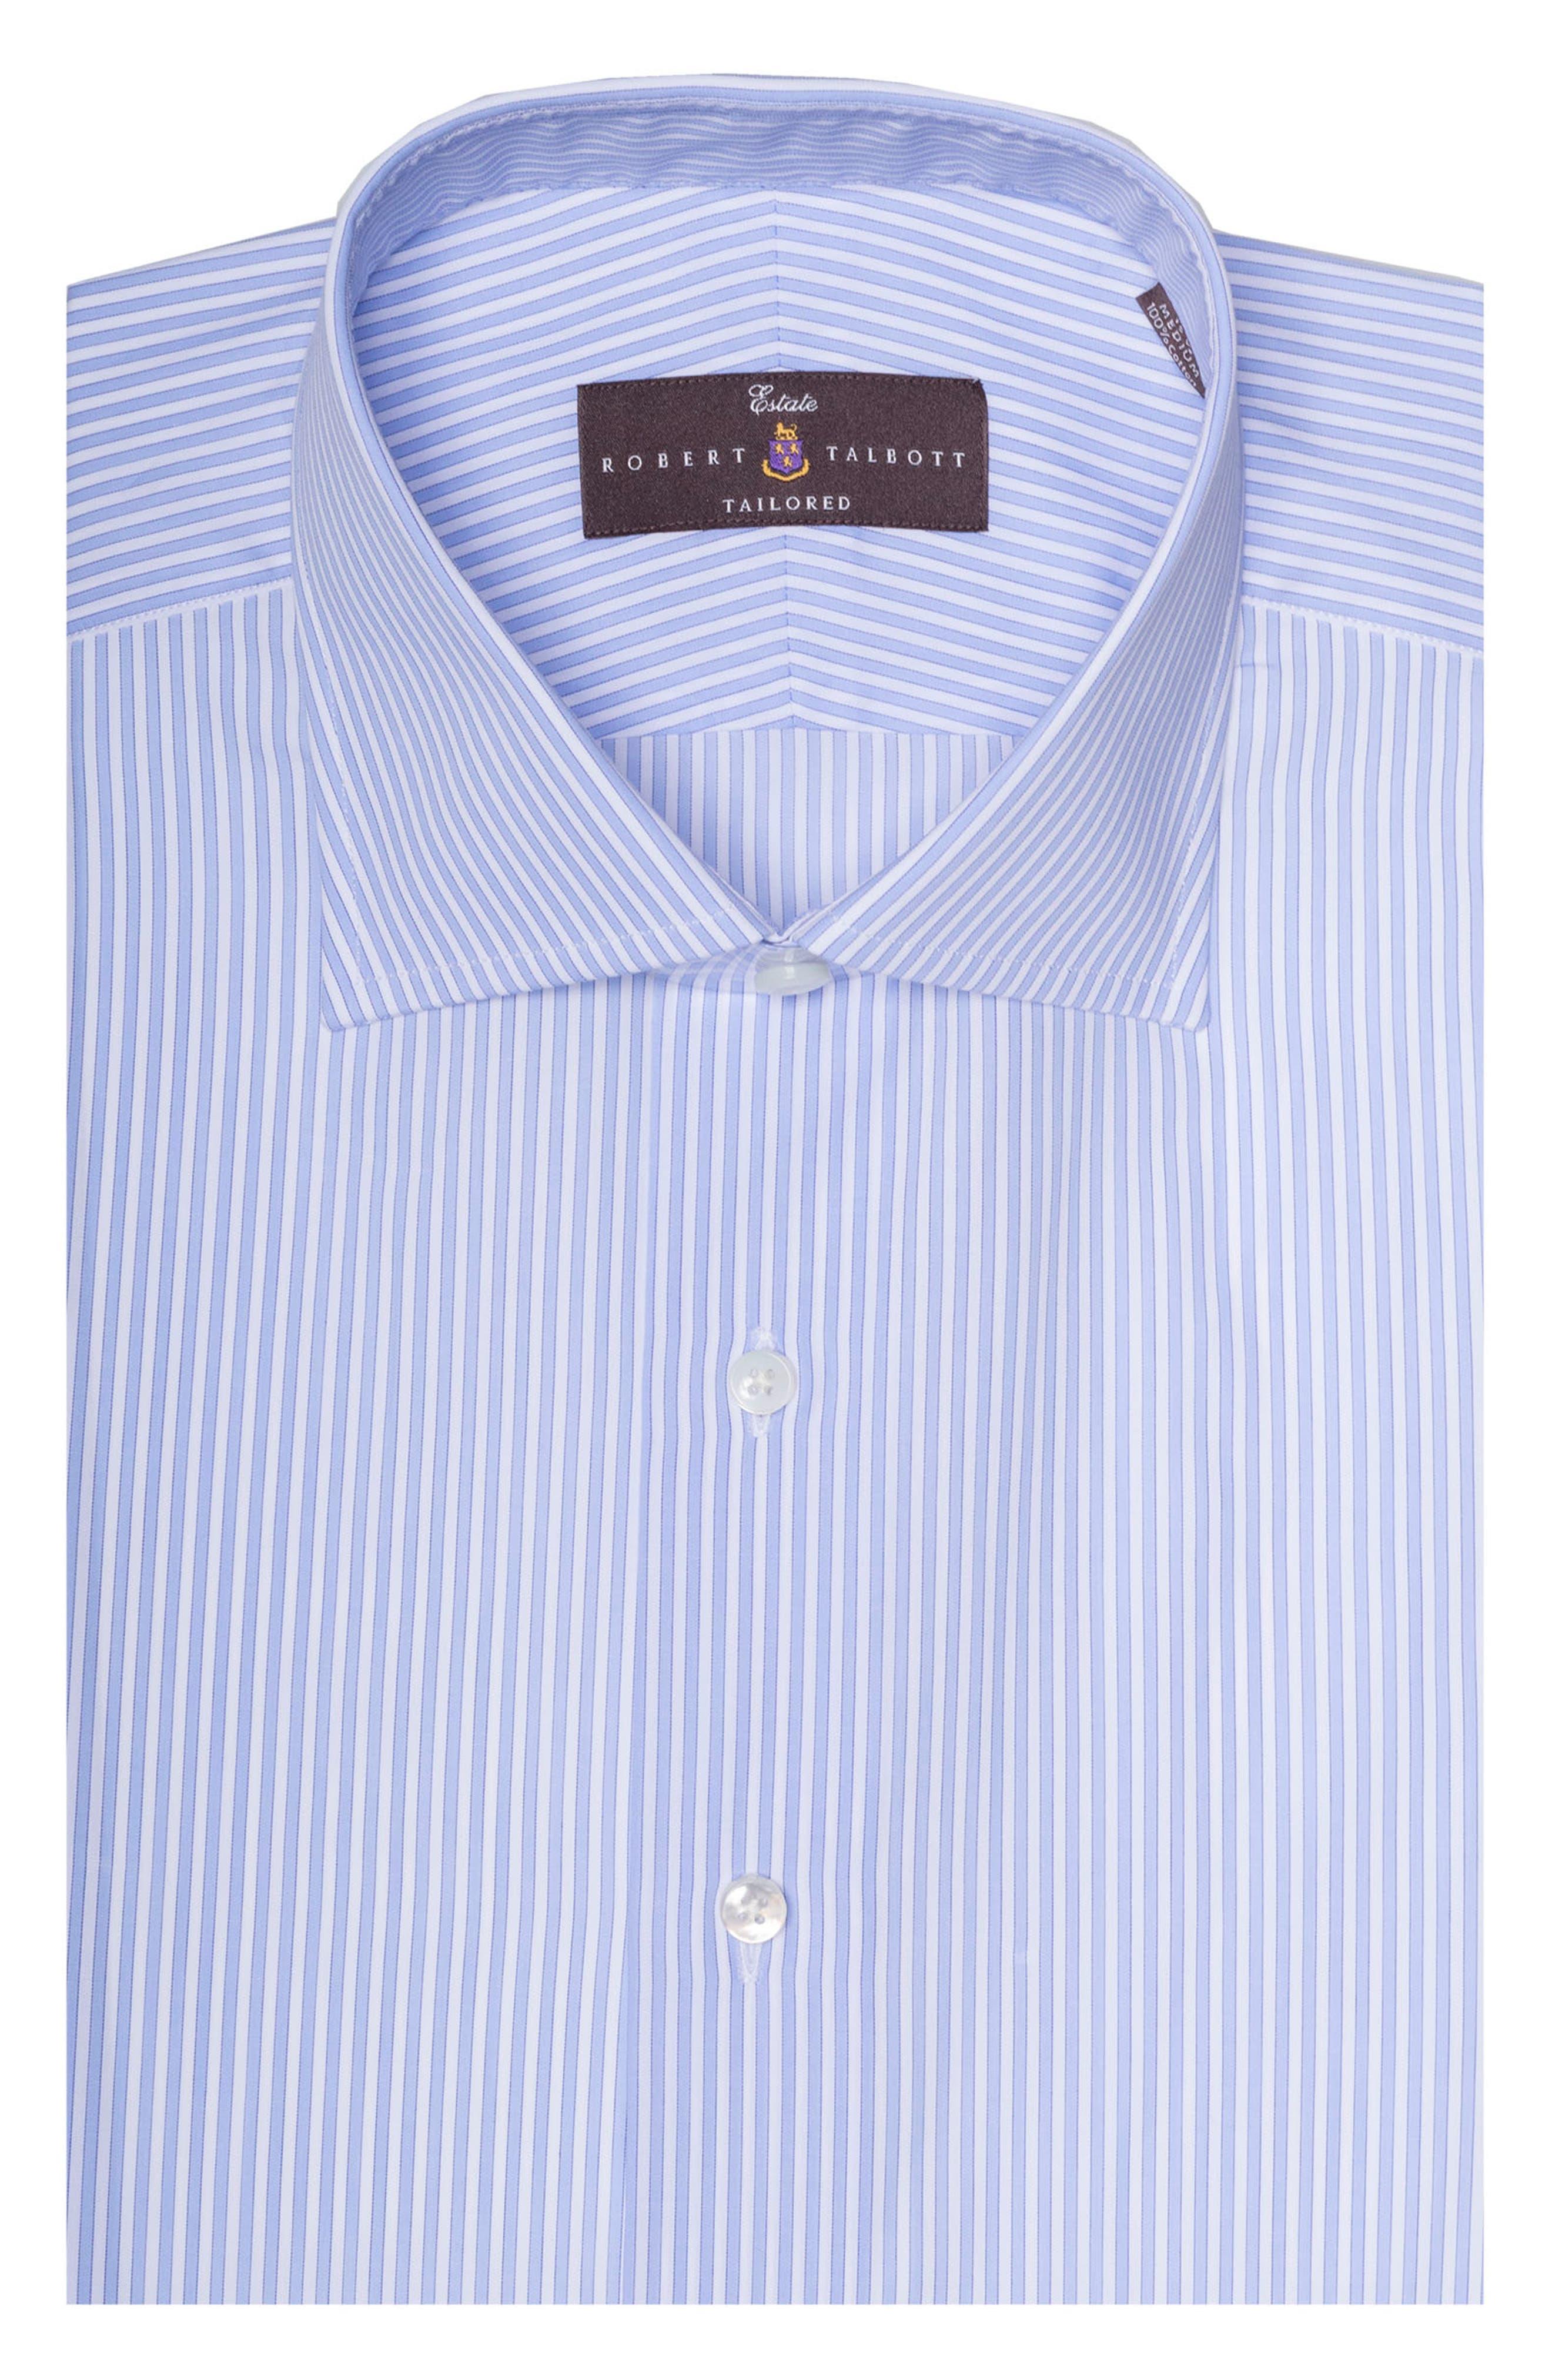 Tailored Fit Stripe Dress Shirt,                             Main thumbnail 1, color,                             SKY